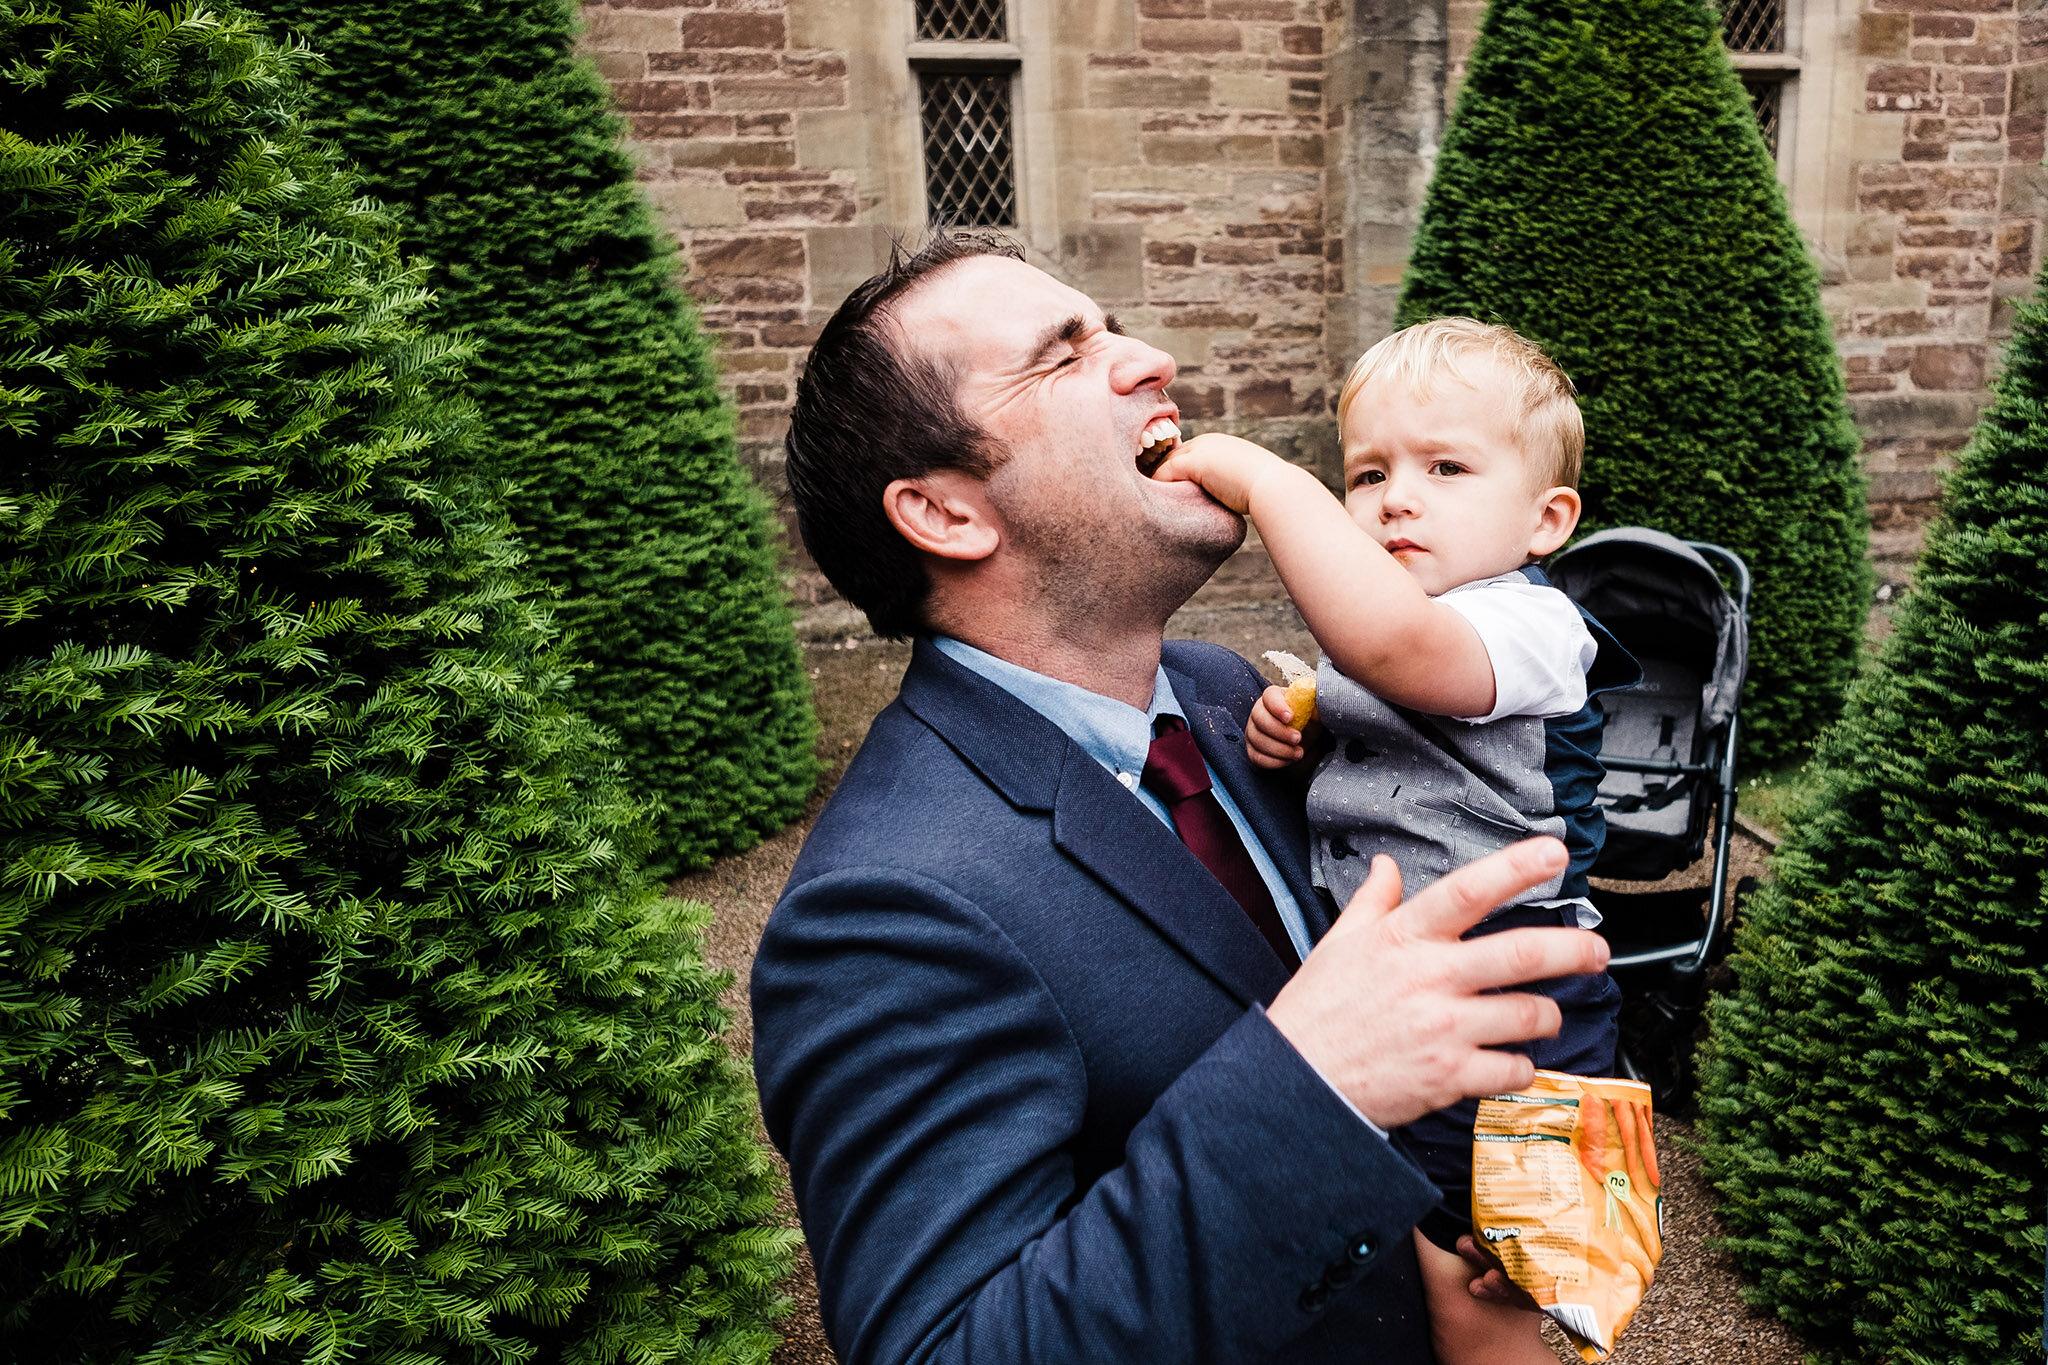 Scott-Stockwell-Photography-wedding-photographer-hampton-court-castle-child.jpg